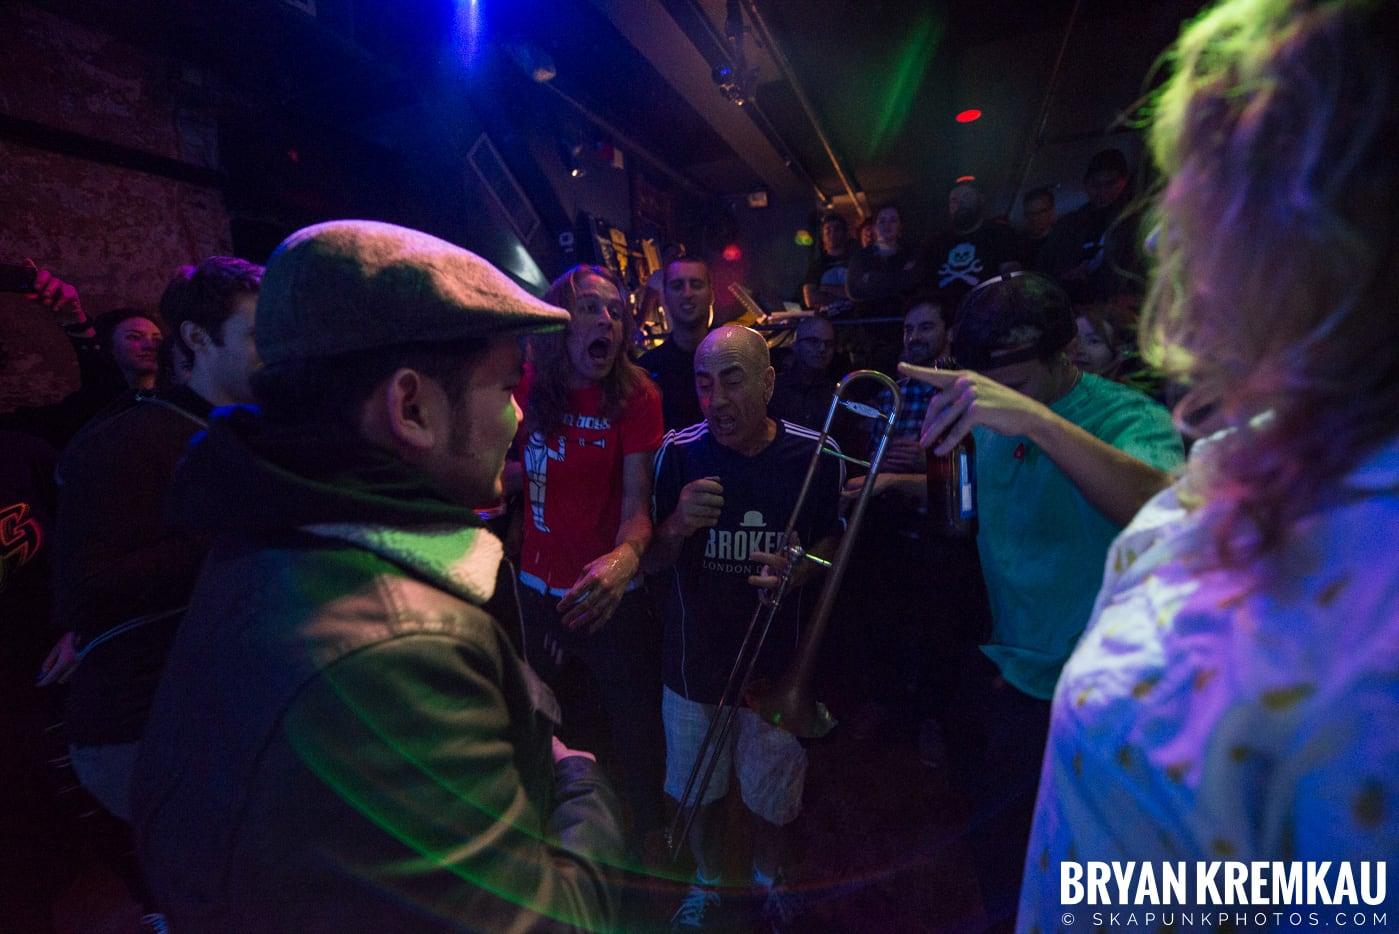 Cenzo @ Bowery Electric, NYC - 11.17.18 (16)